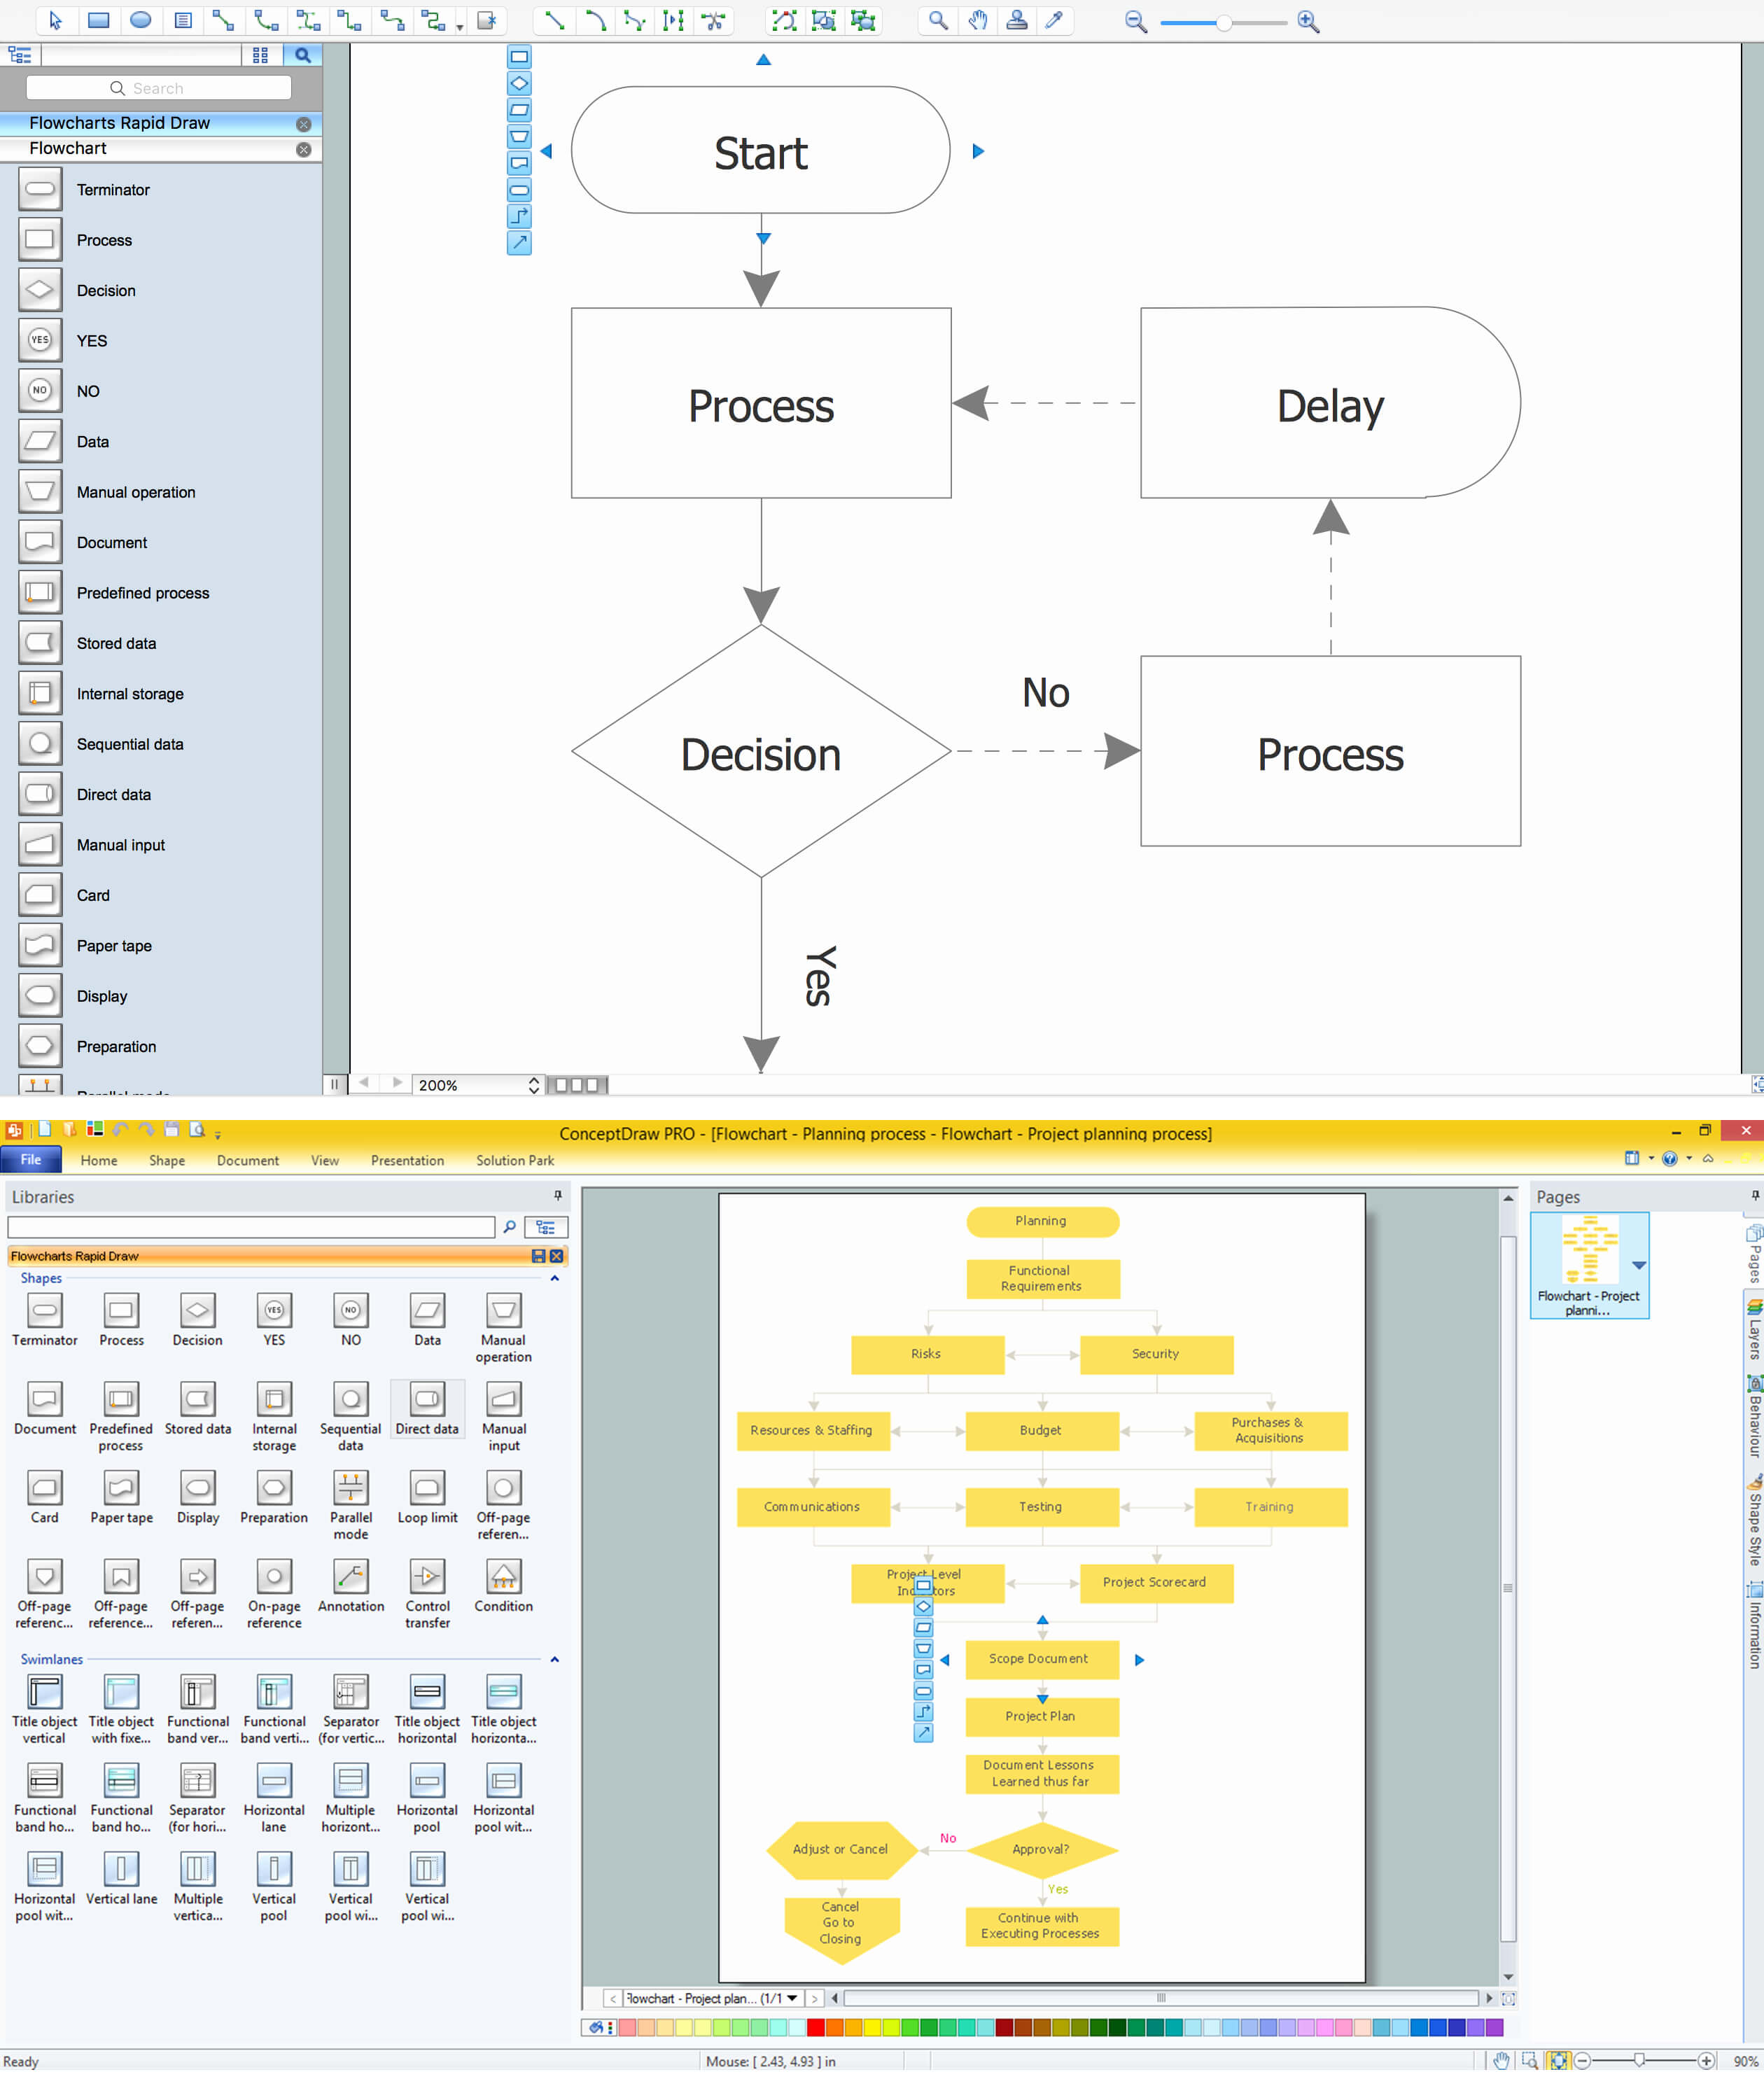 009 Free Flowchart Template Word Ideas Templates For Throughout Microsoft Word Flowchart Template